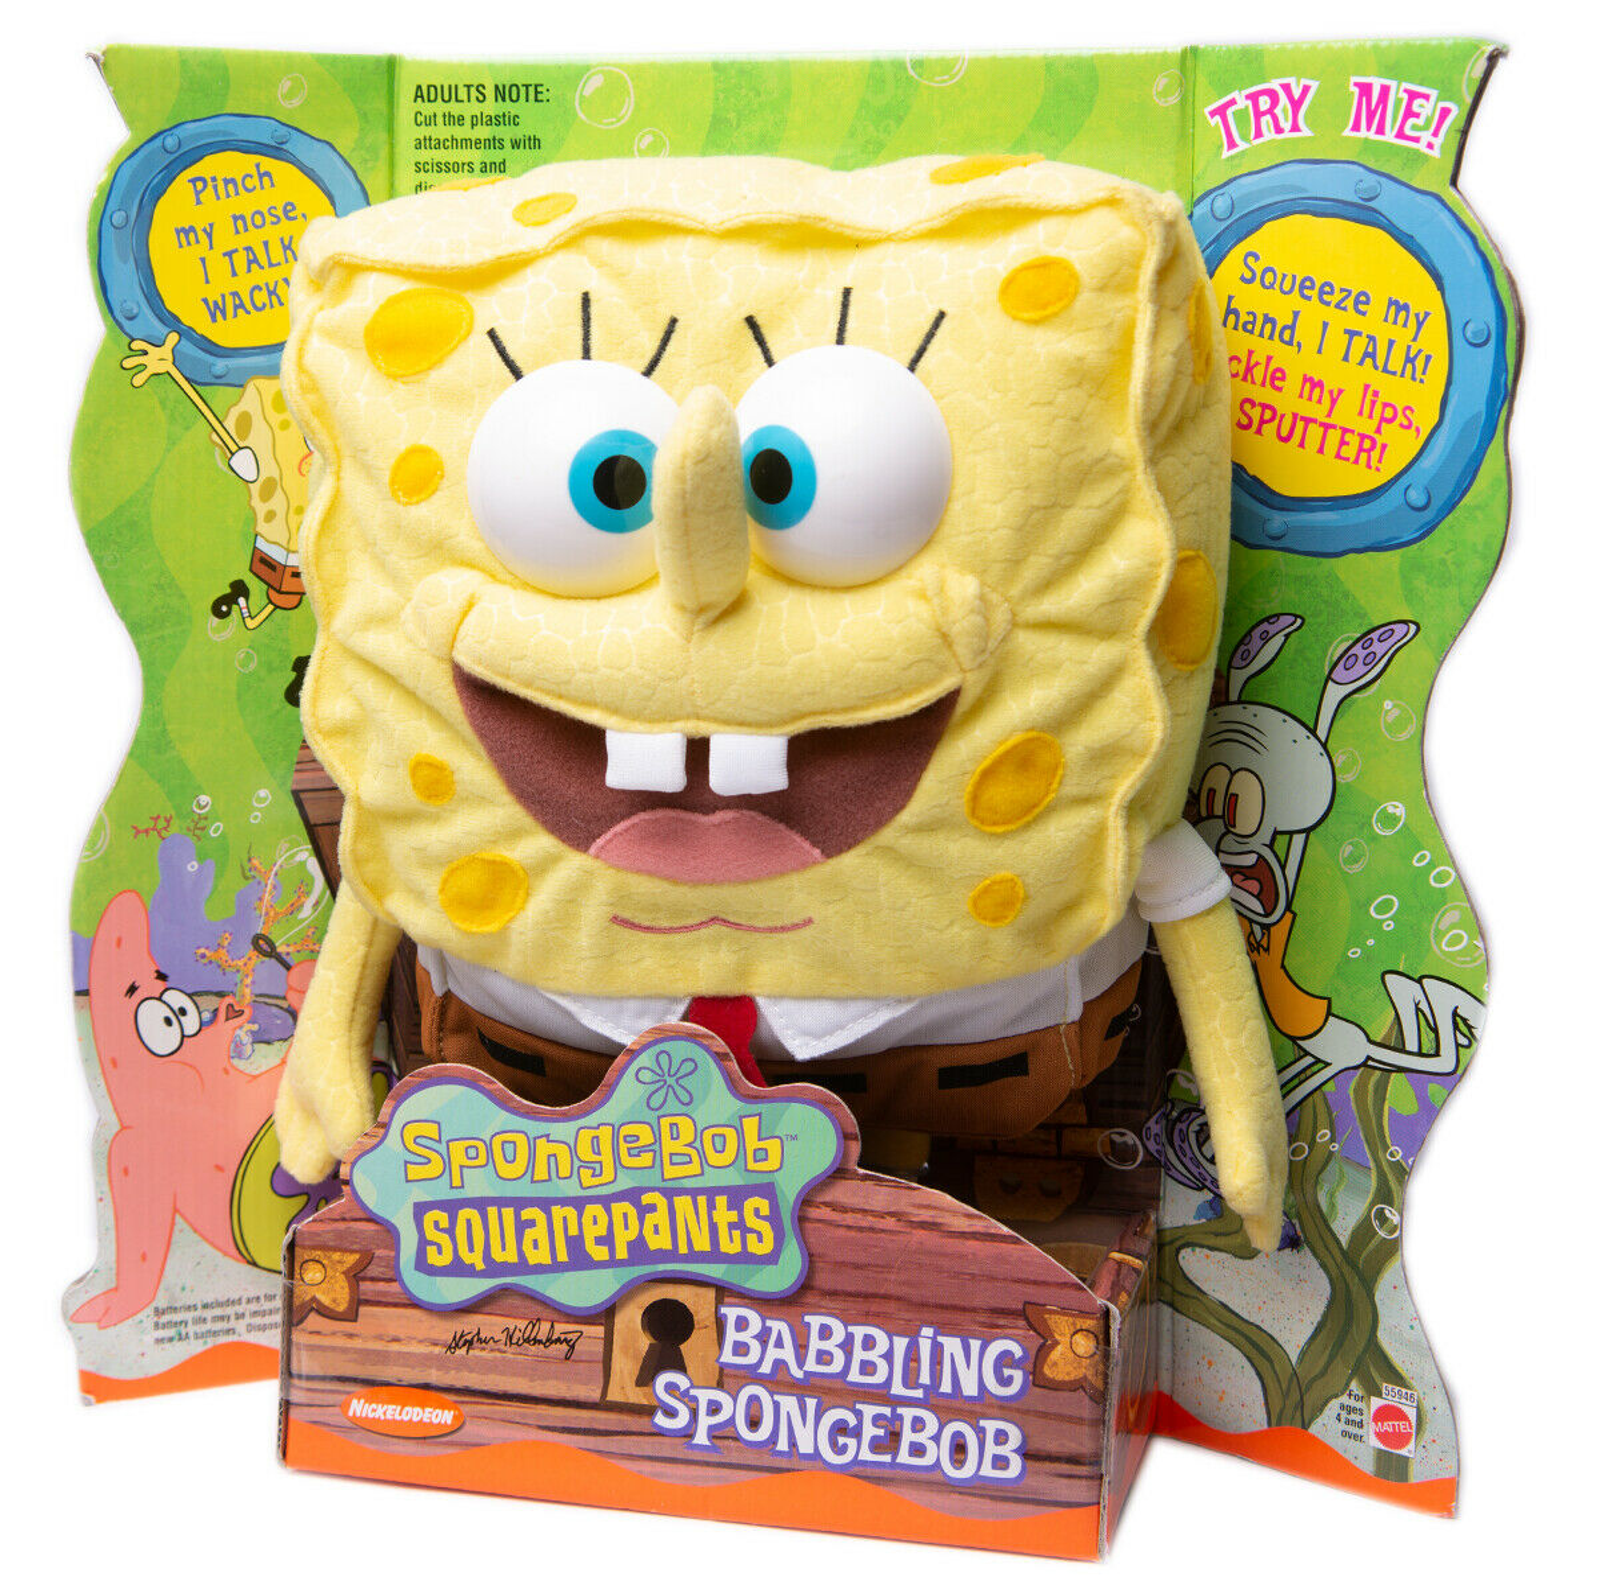 File:Babblingspongebob.jpg